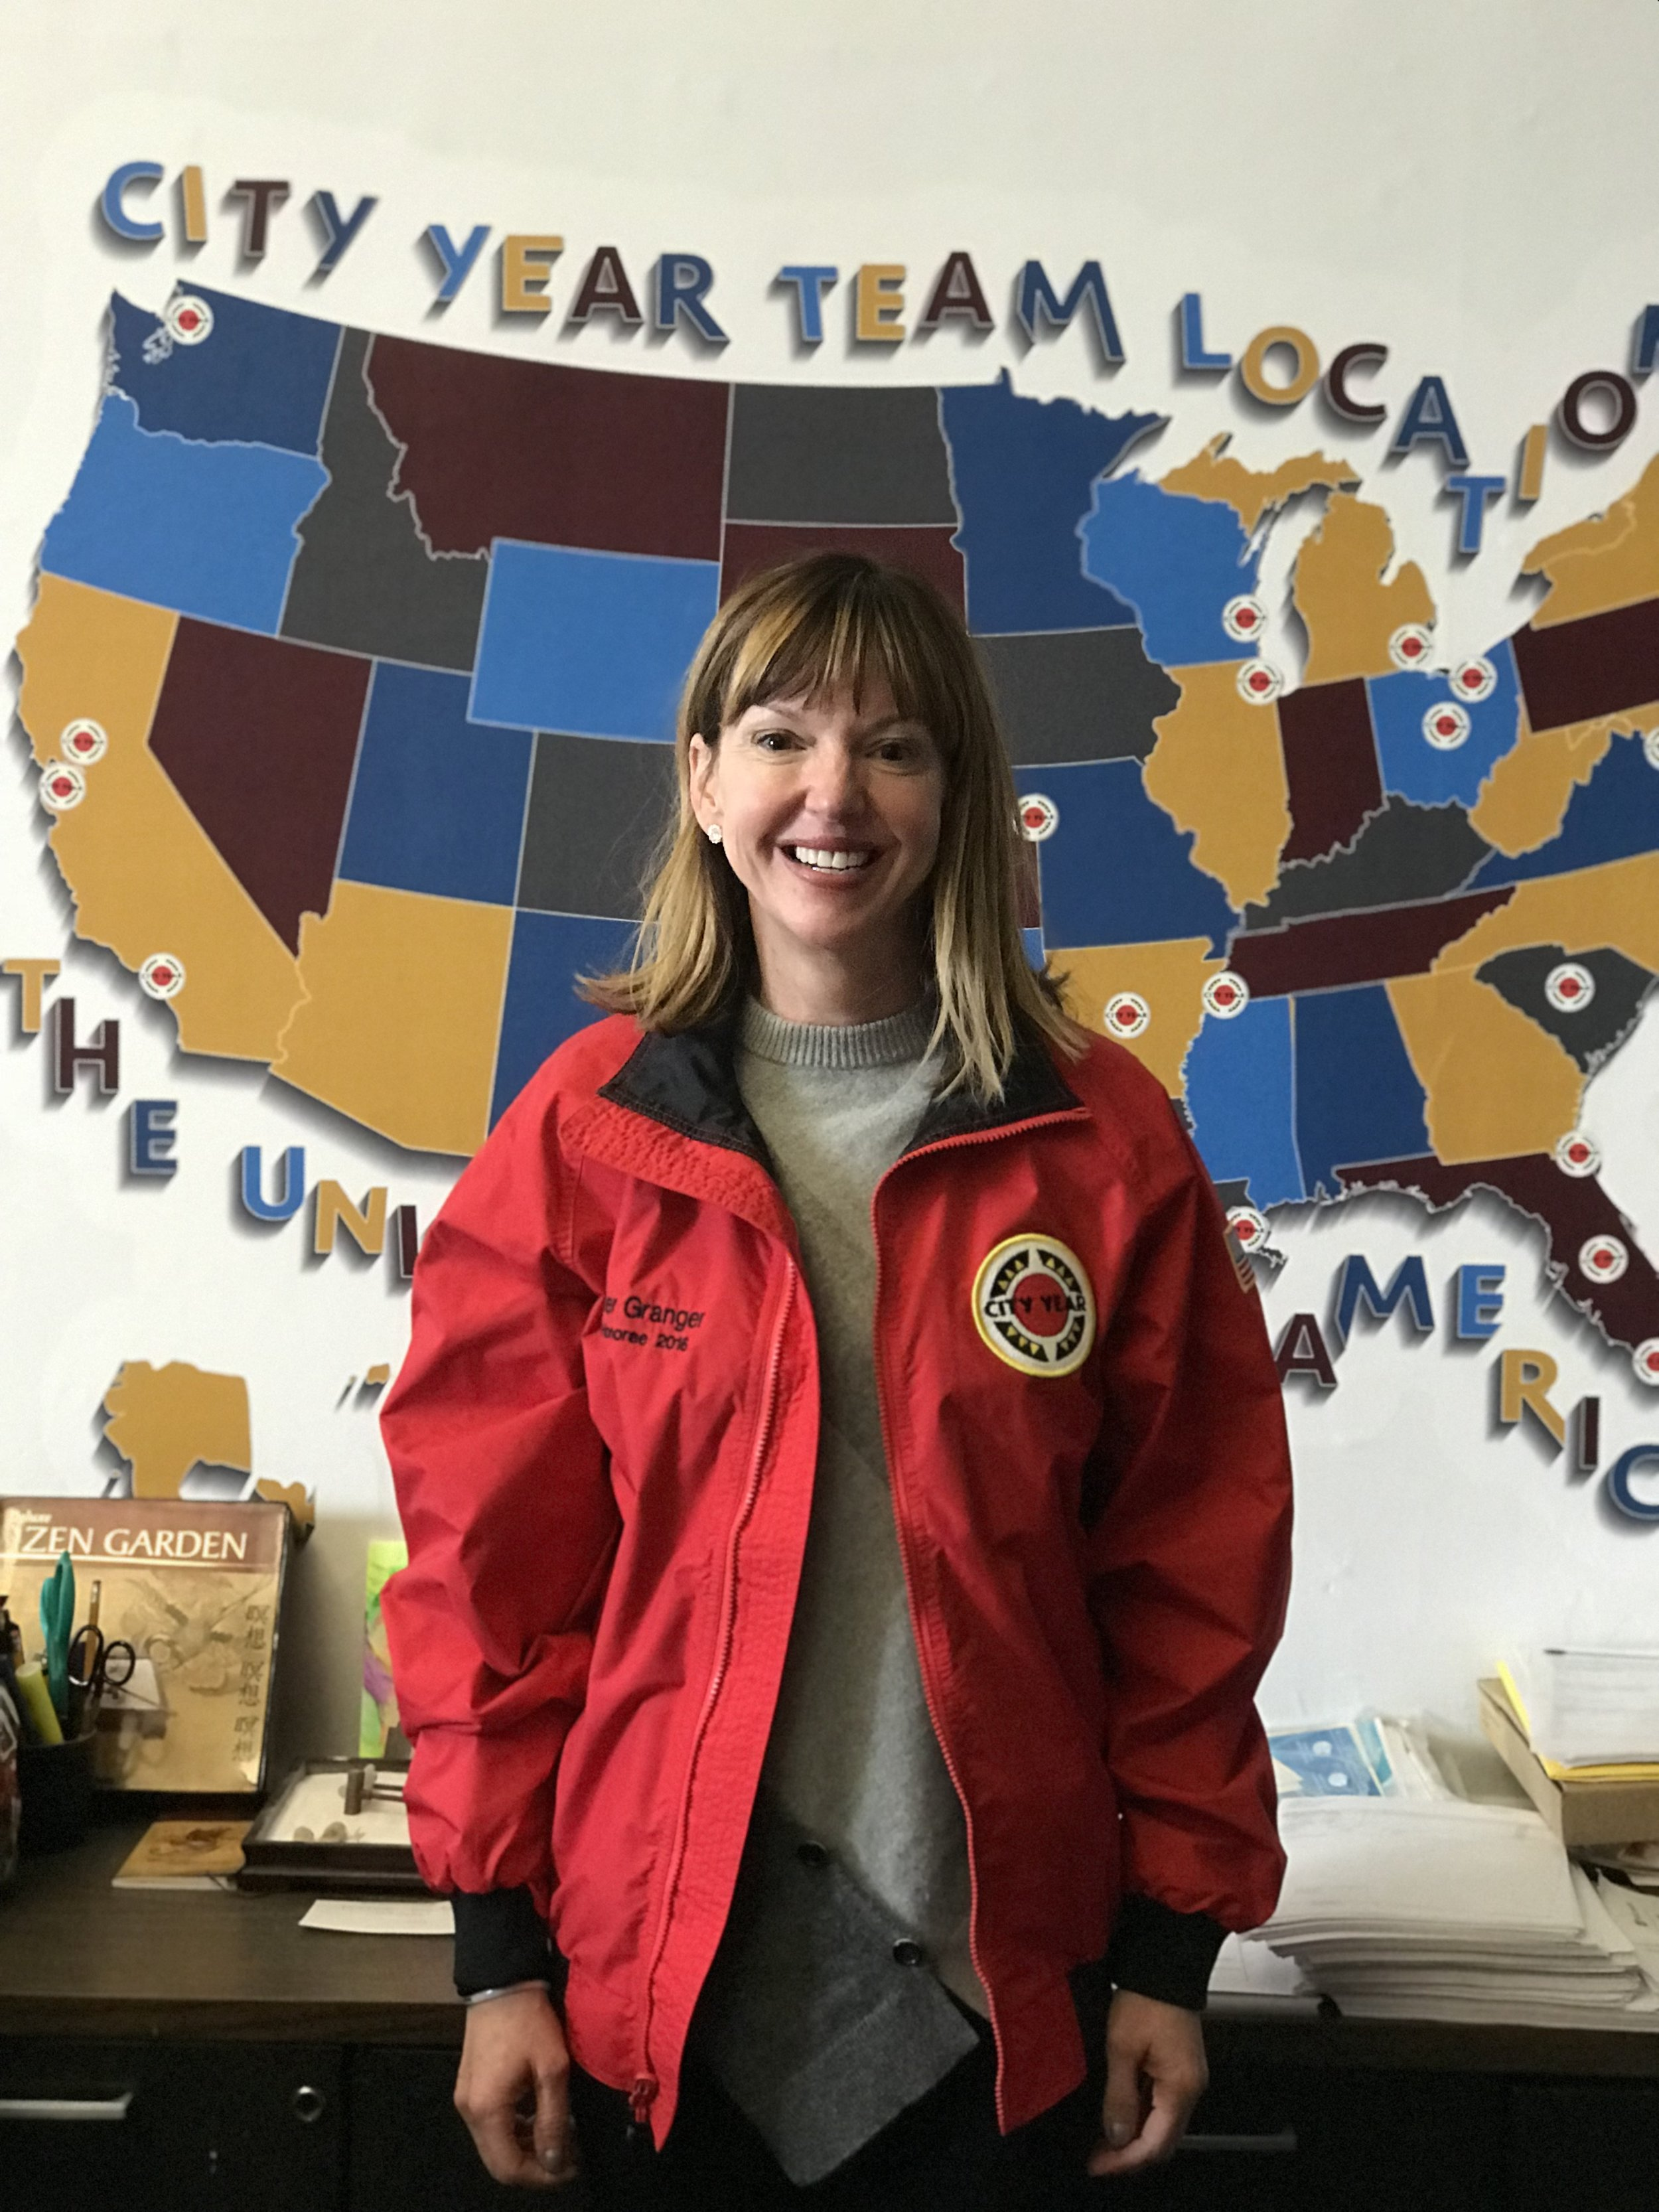 Jennifer Granger in her City Year red jacket